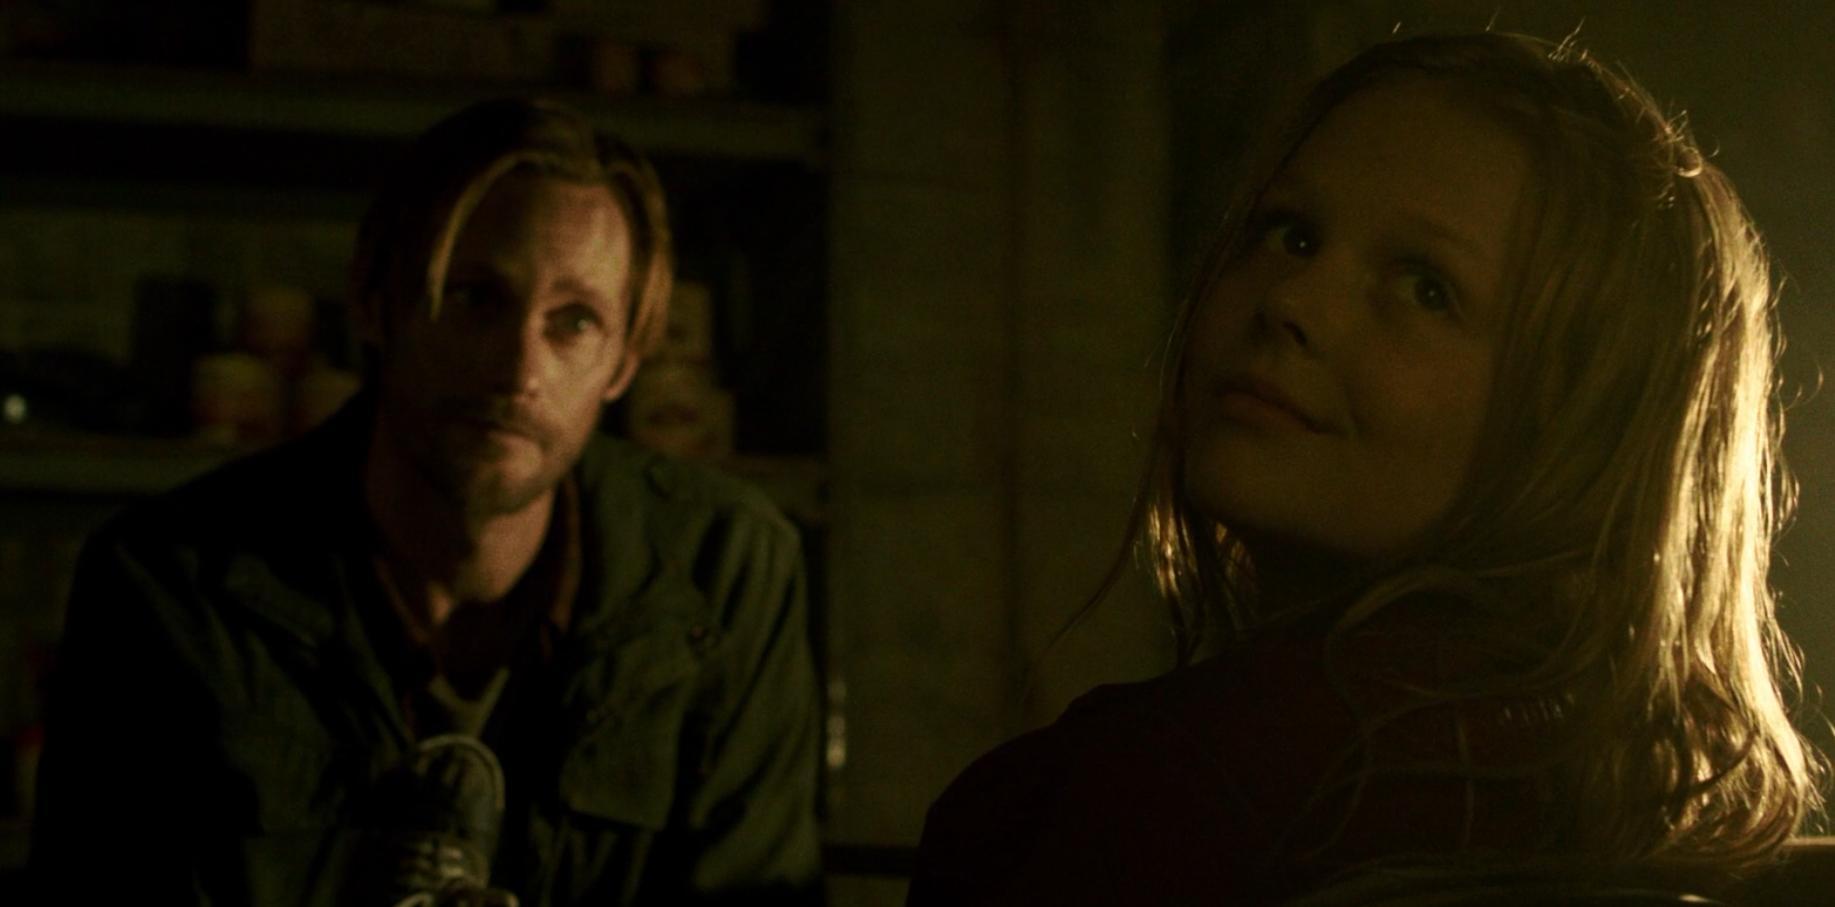 Alexander Skarsgård and Emily Alyn Lind in Hidden (2015)